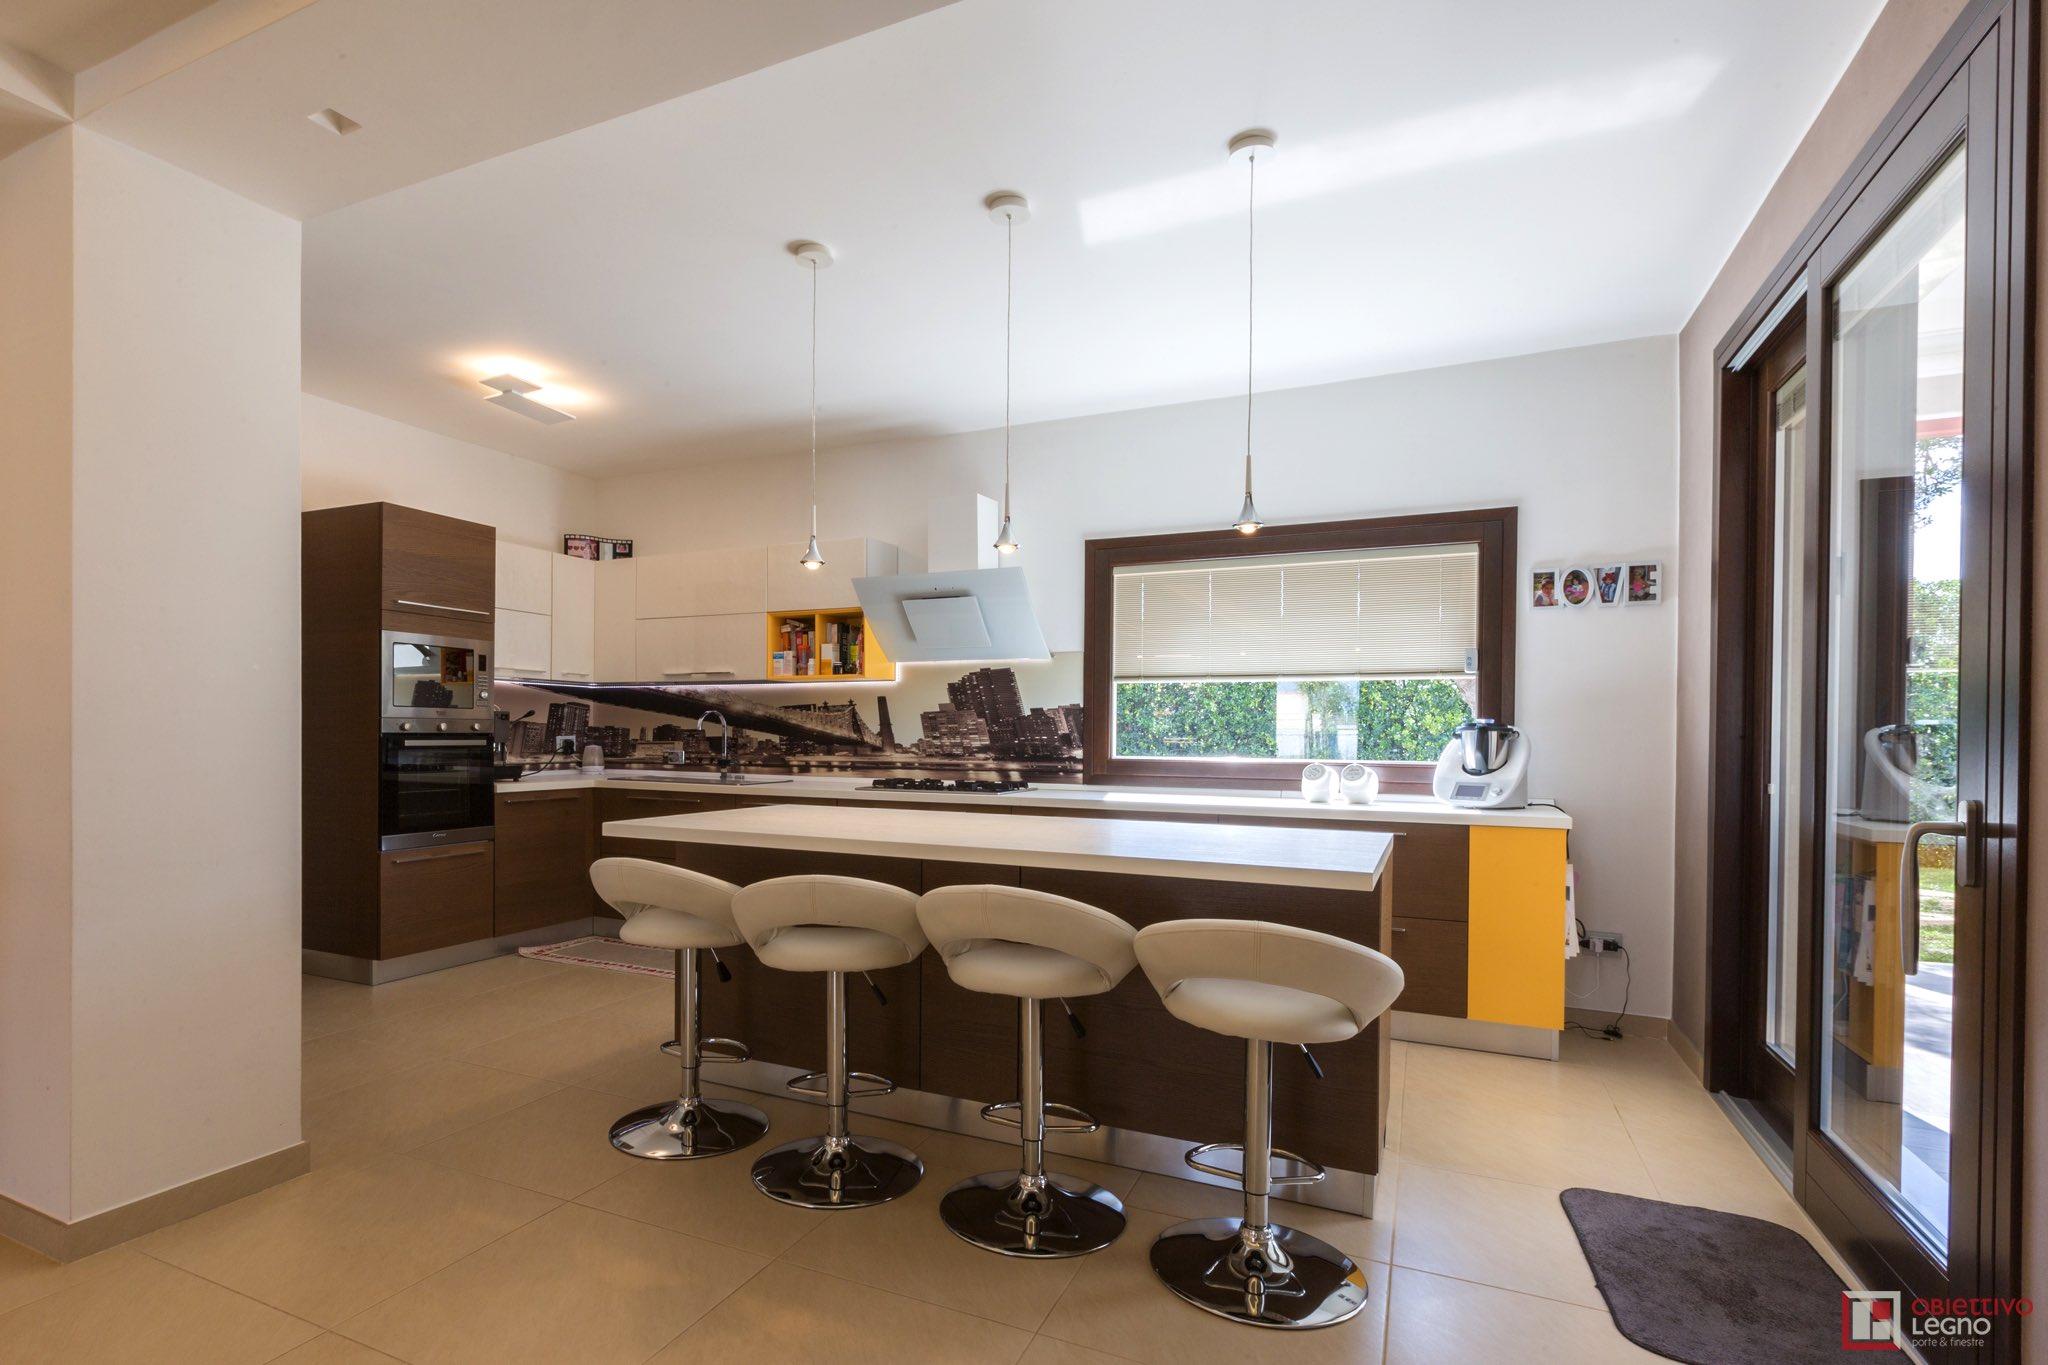 Infissi Casa Stile Moderno